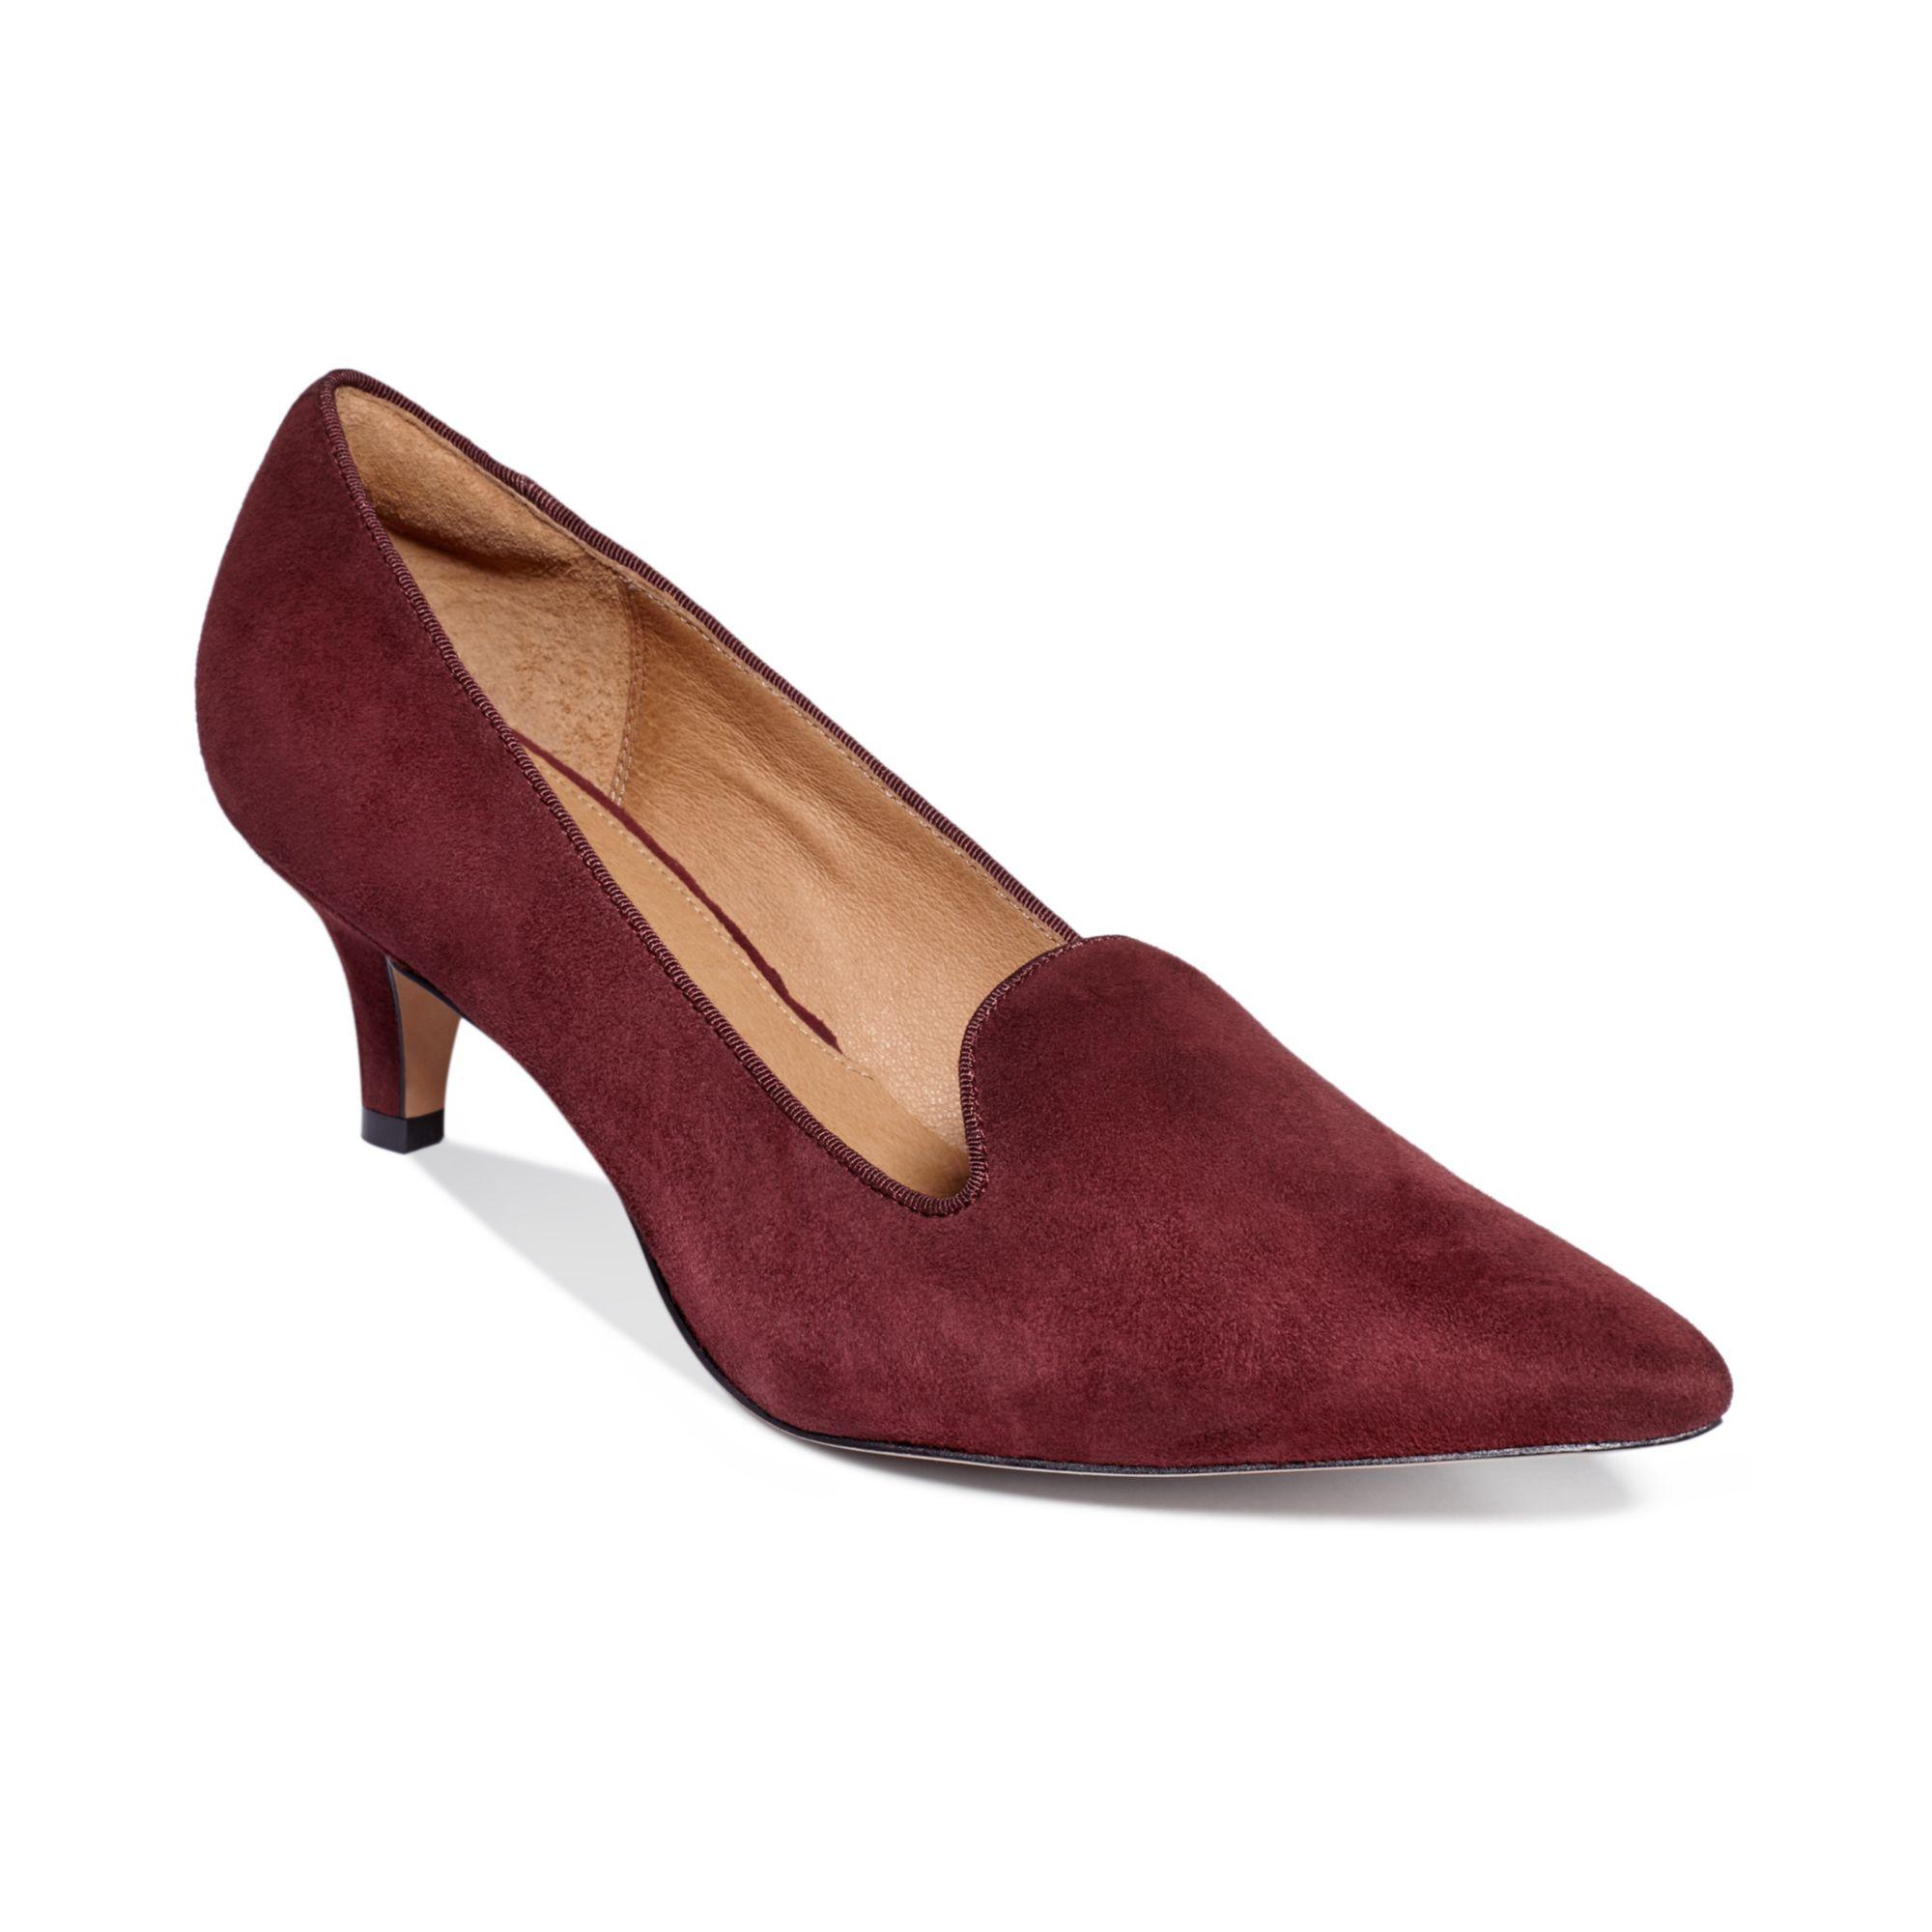 Nordstrom Shoes Womens Heels